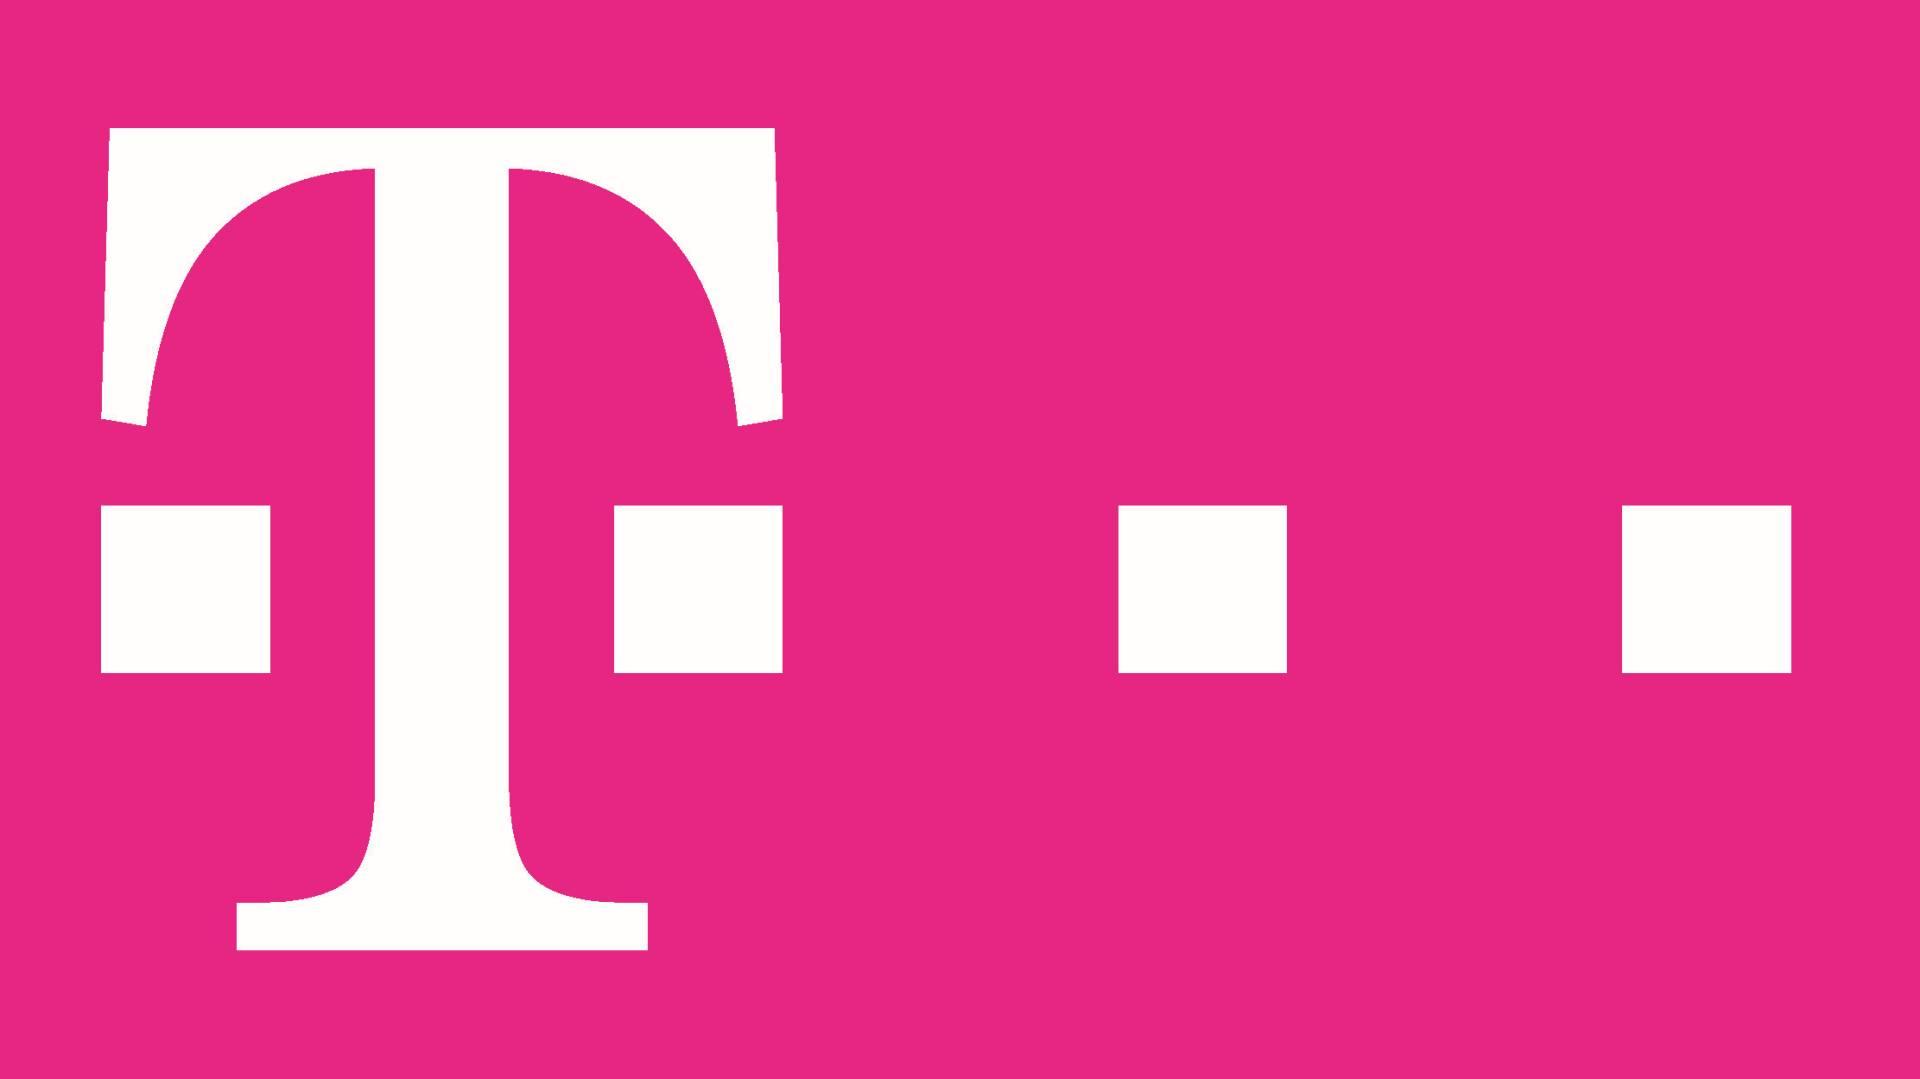 Telekom obstacolul